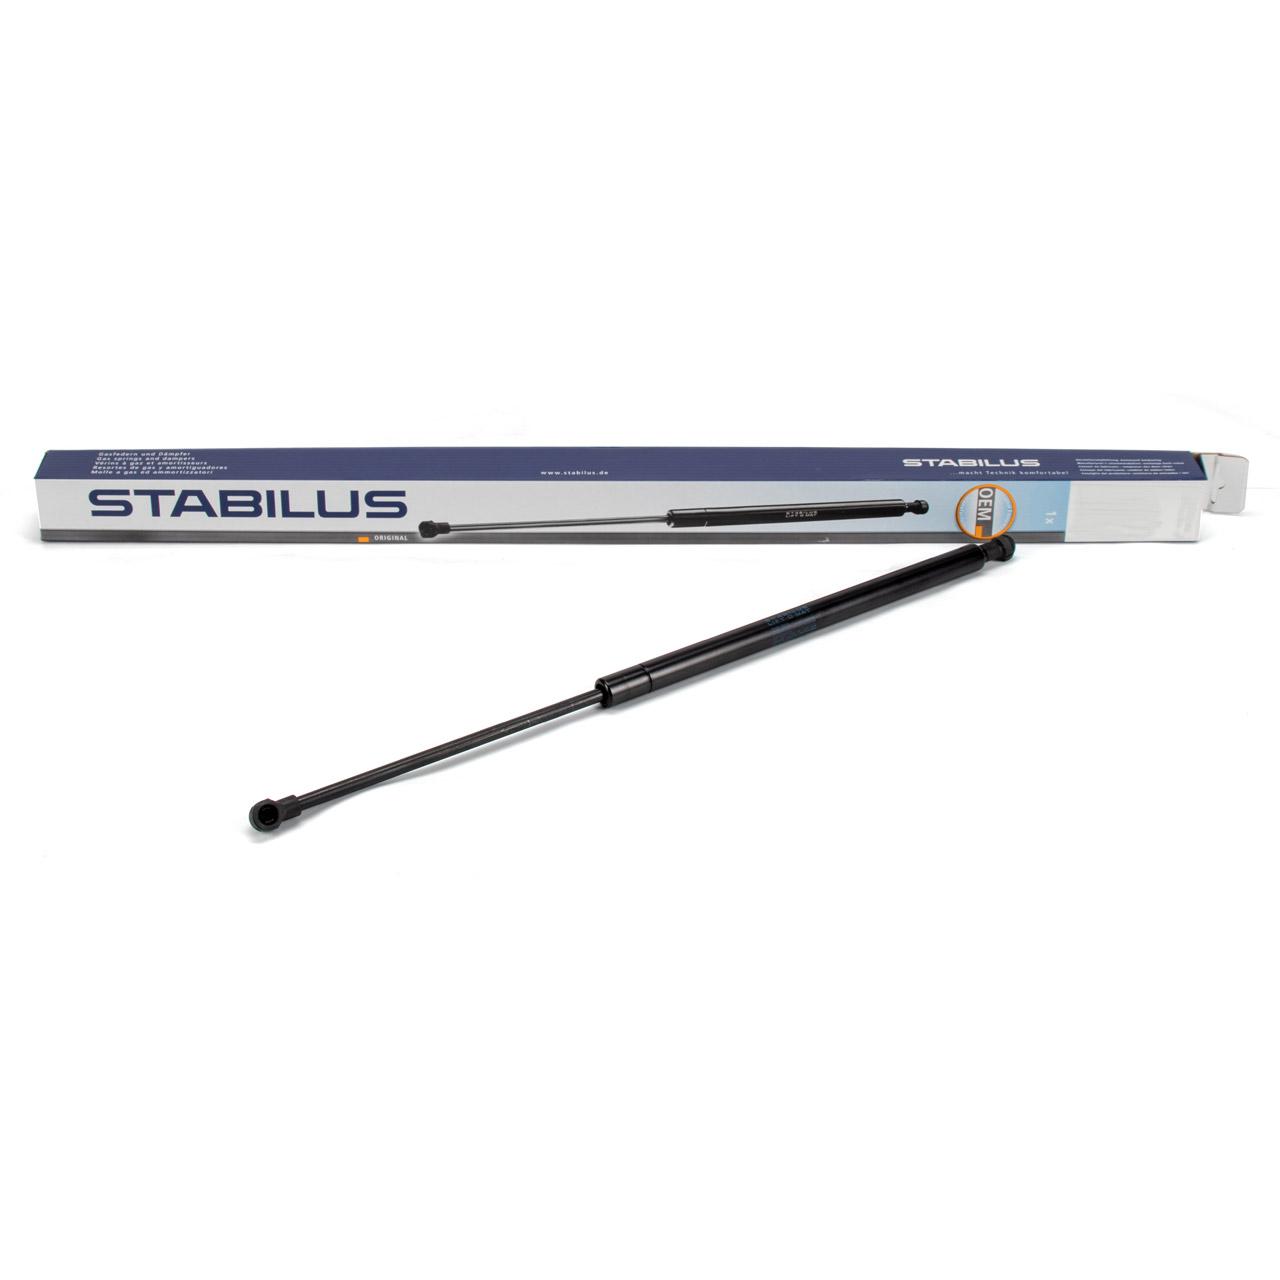 STABILUS 018123 Heckklappendämpfer Gasdruckdämpfer VW Polo 9N 6Q6827550D